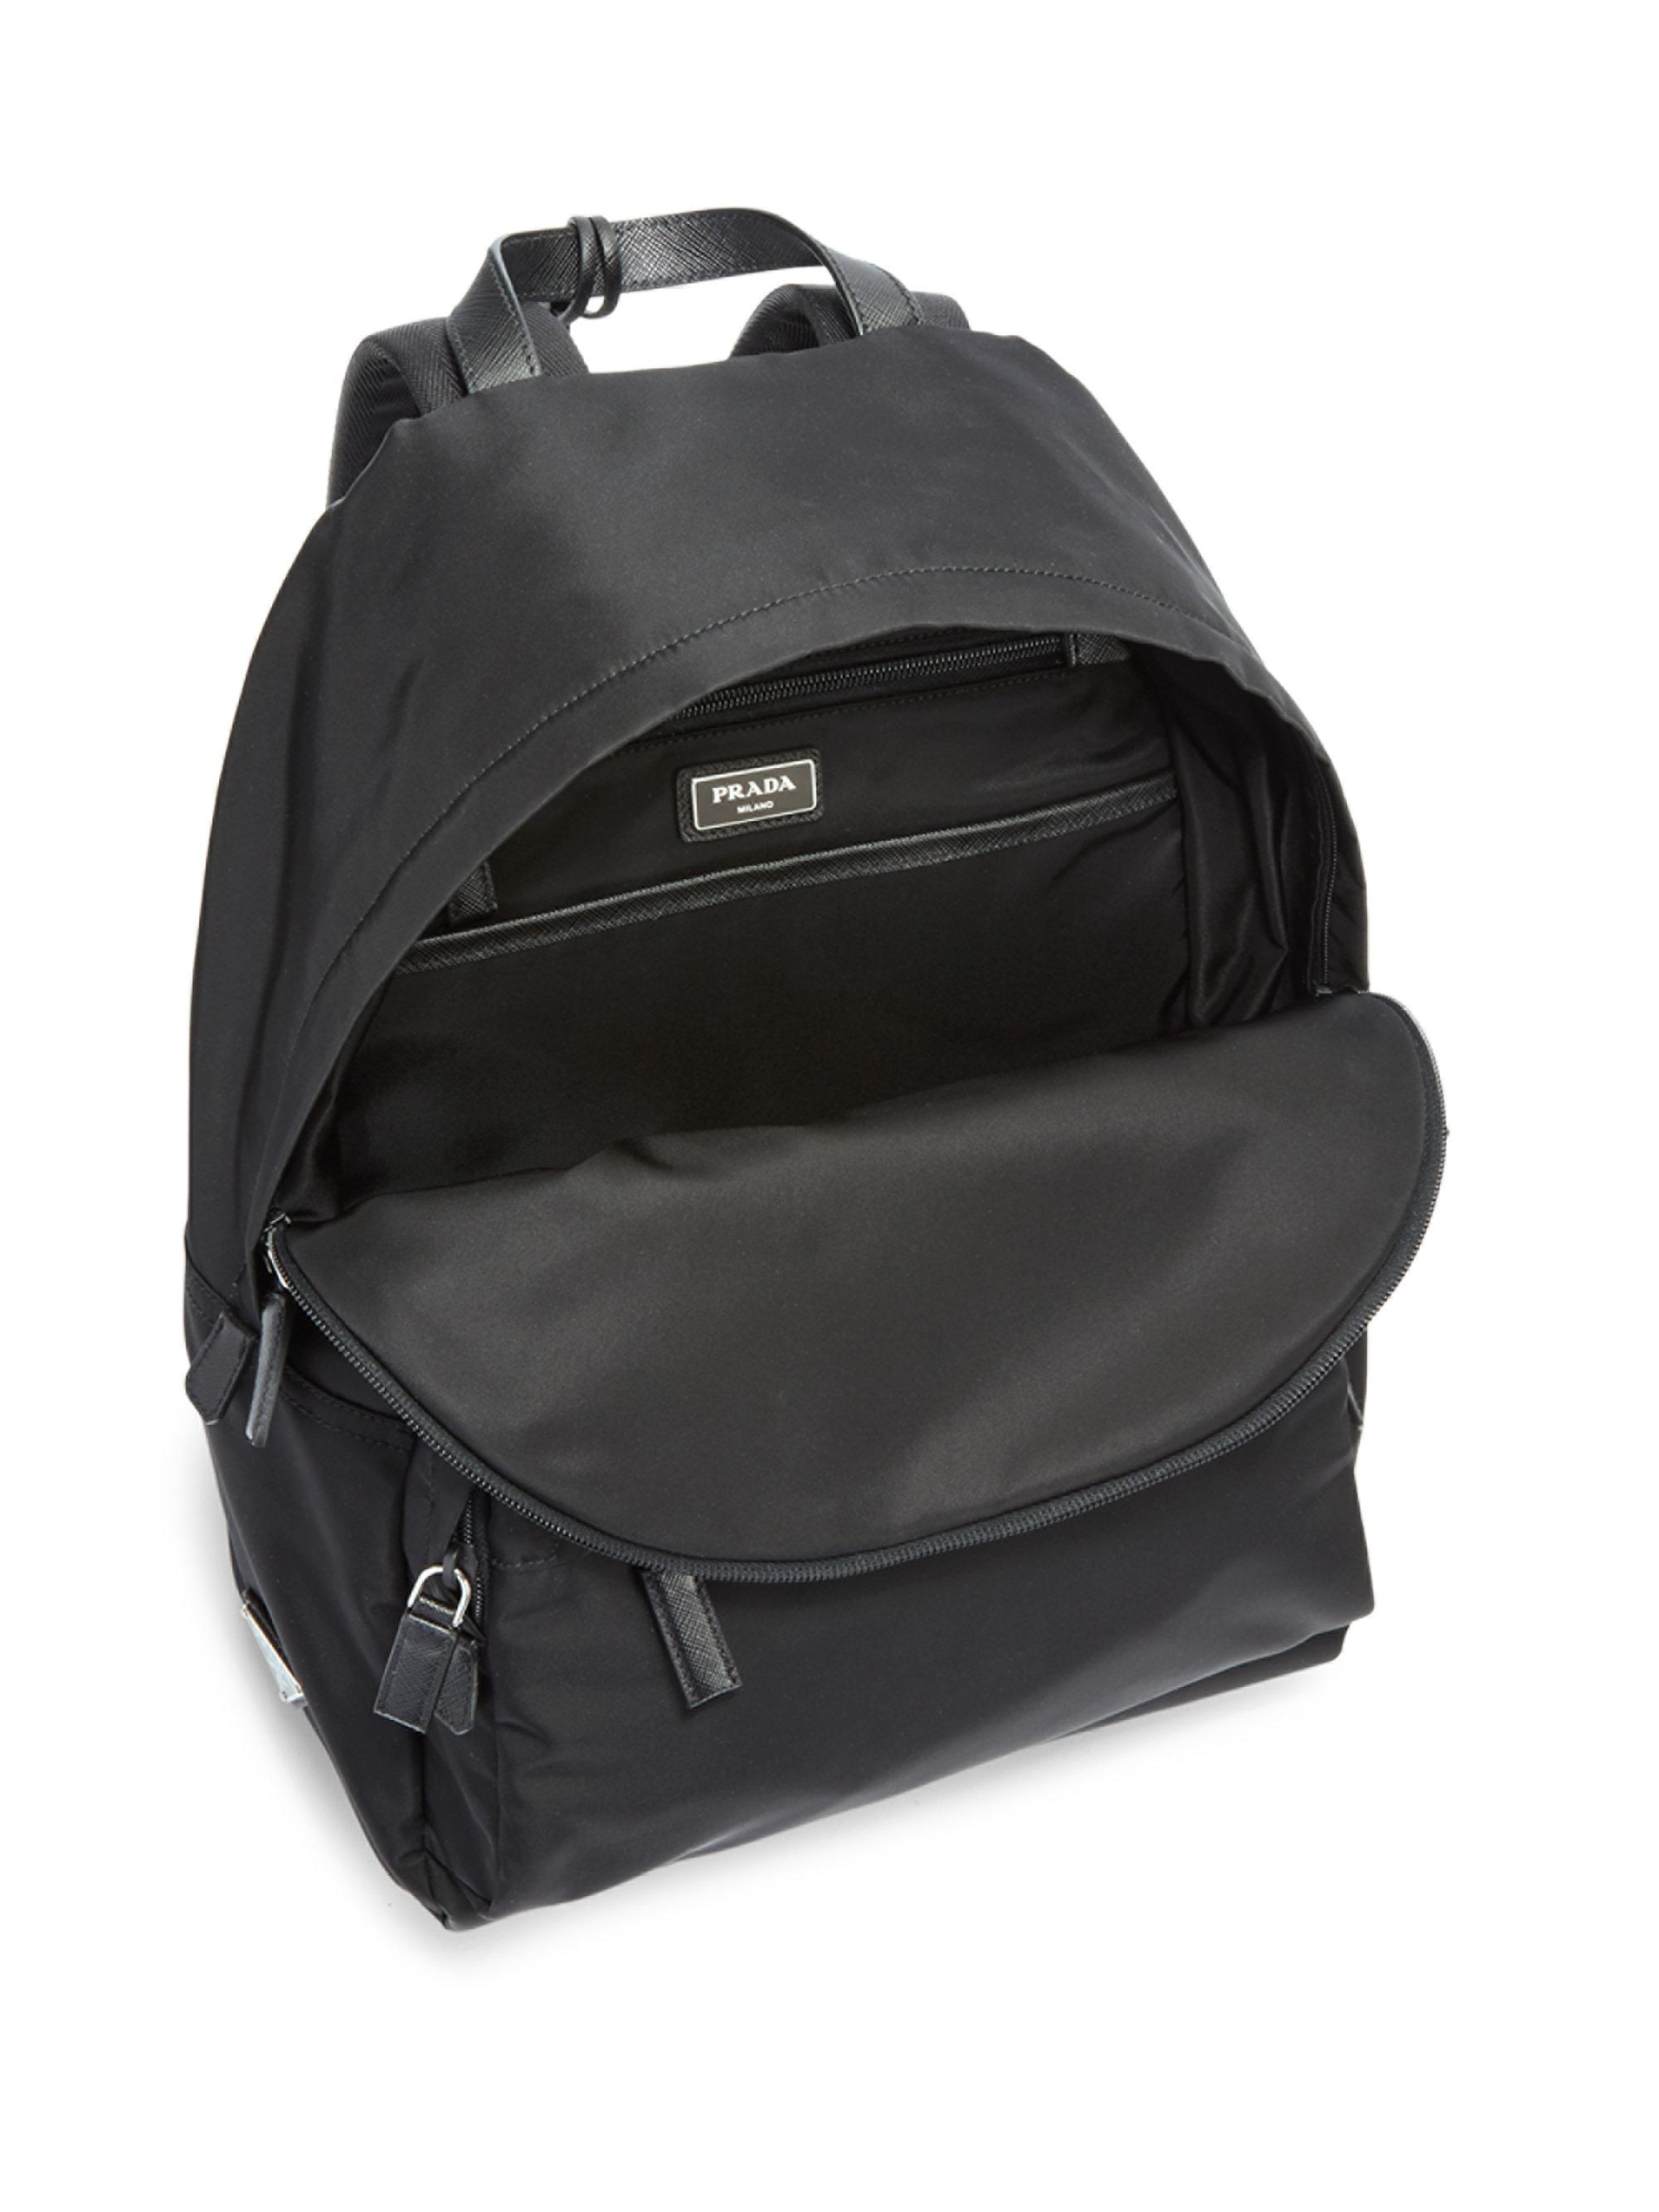 6fe91f37c5aa ... france prada zaino backpack in black for men lyst 3241c 1c295